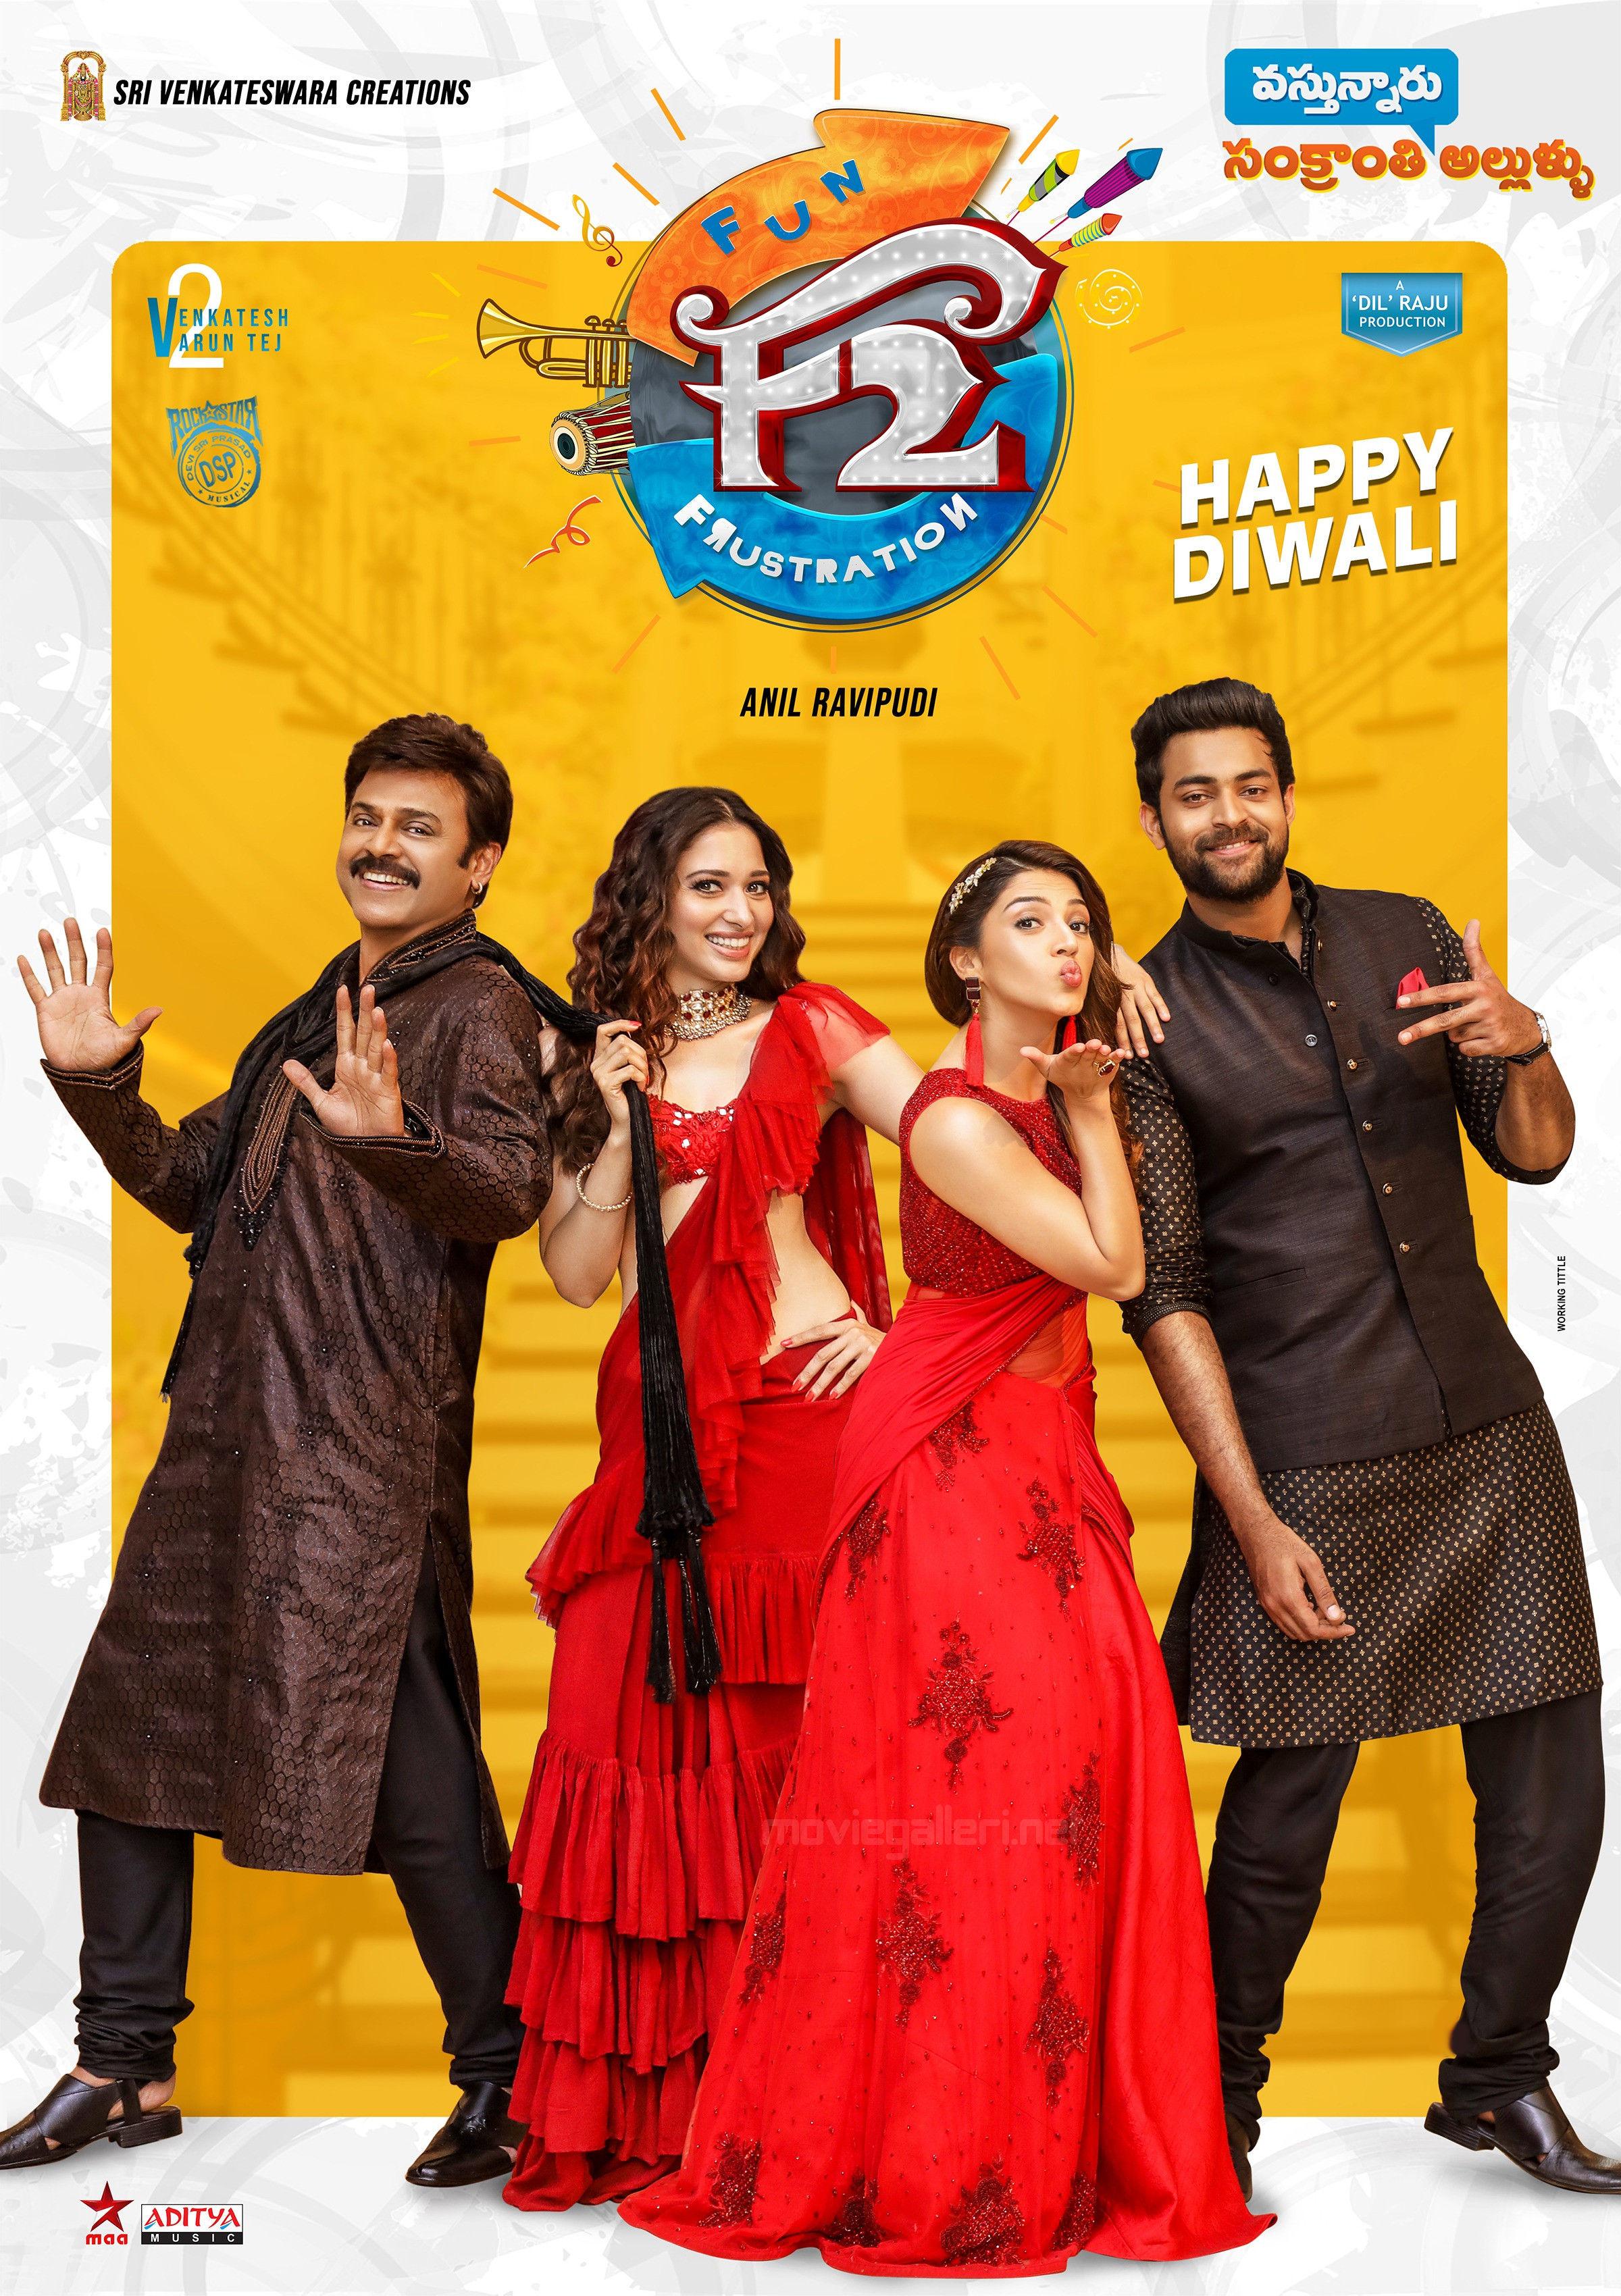 Venkatesh, Varun Tej, Tamannaah Bhatia, Mehreen Pirzada F2 Fun & Frustration First Look Poster HD